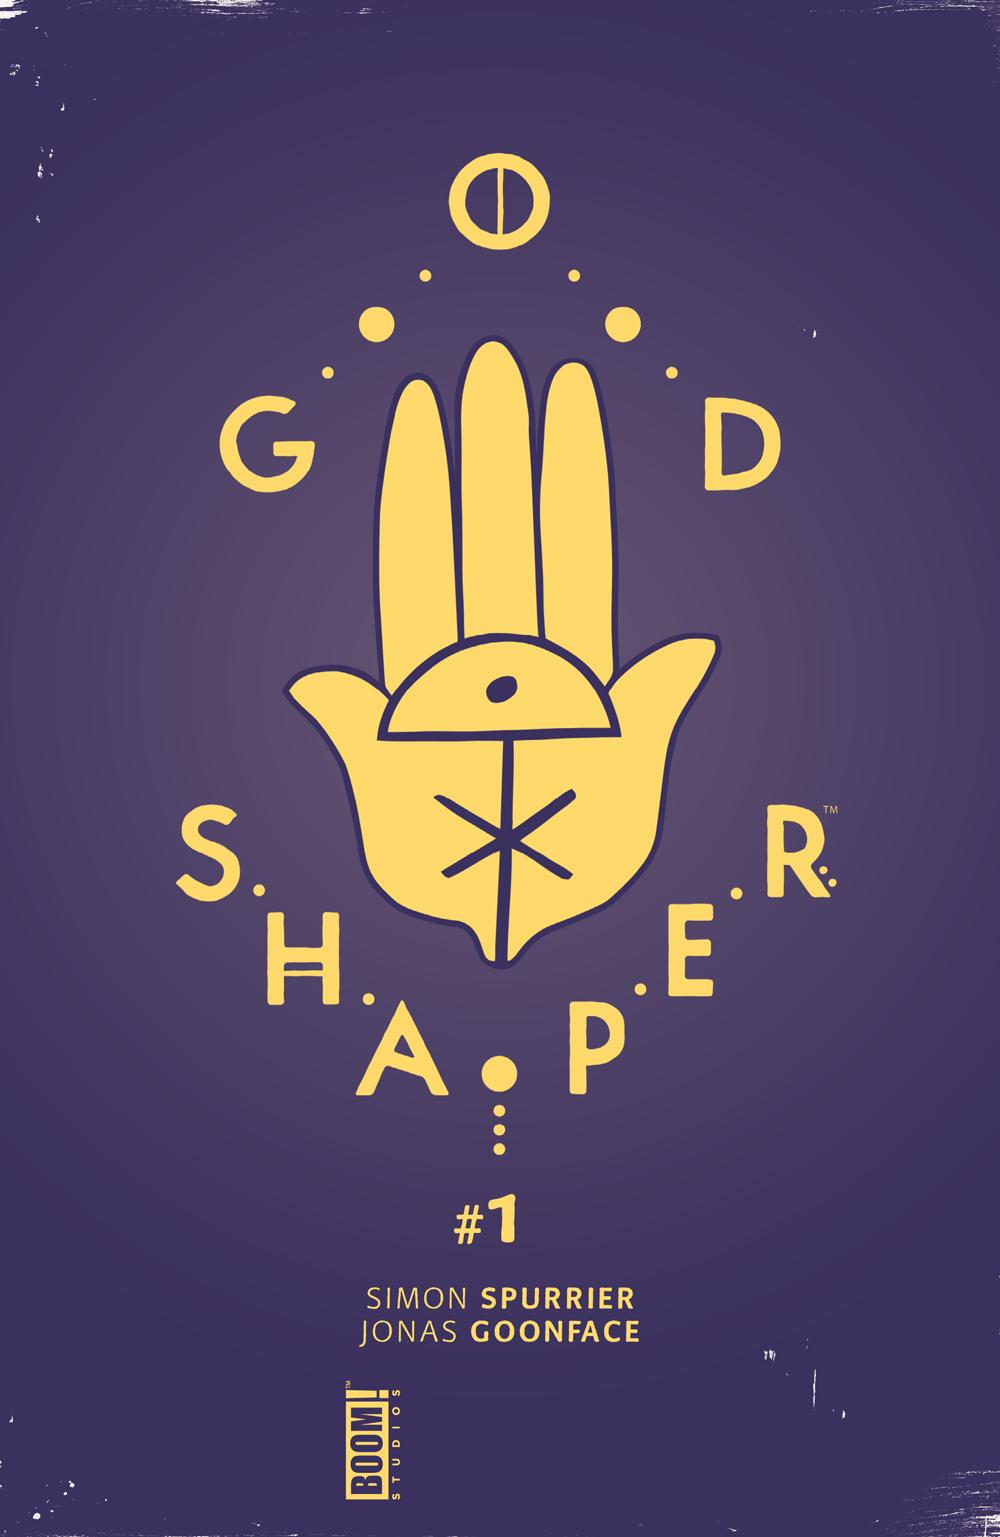 Godshaper_001_2.png